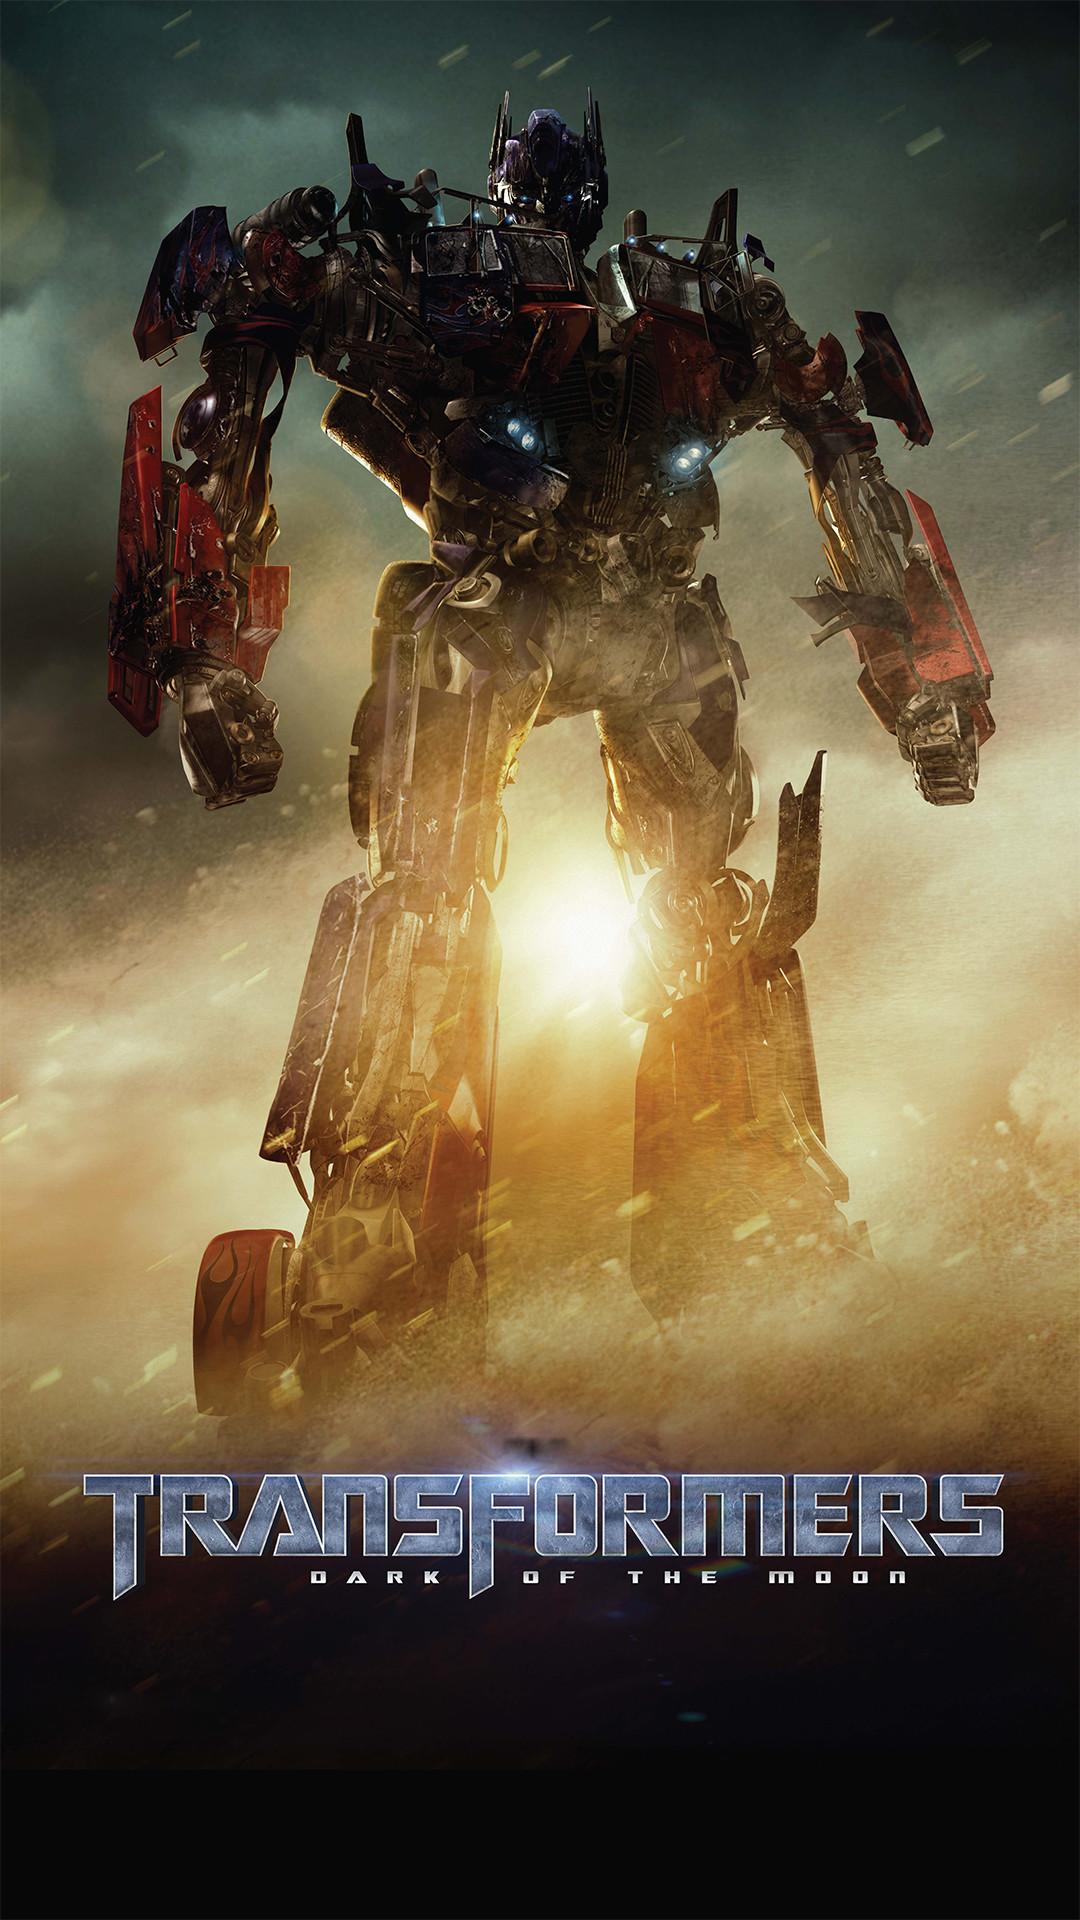 Wallpaper transformers prime 61 images - Transformers prime wallpaper ...